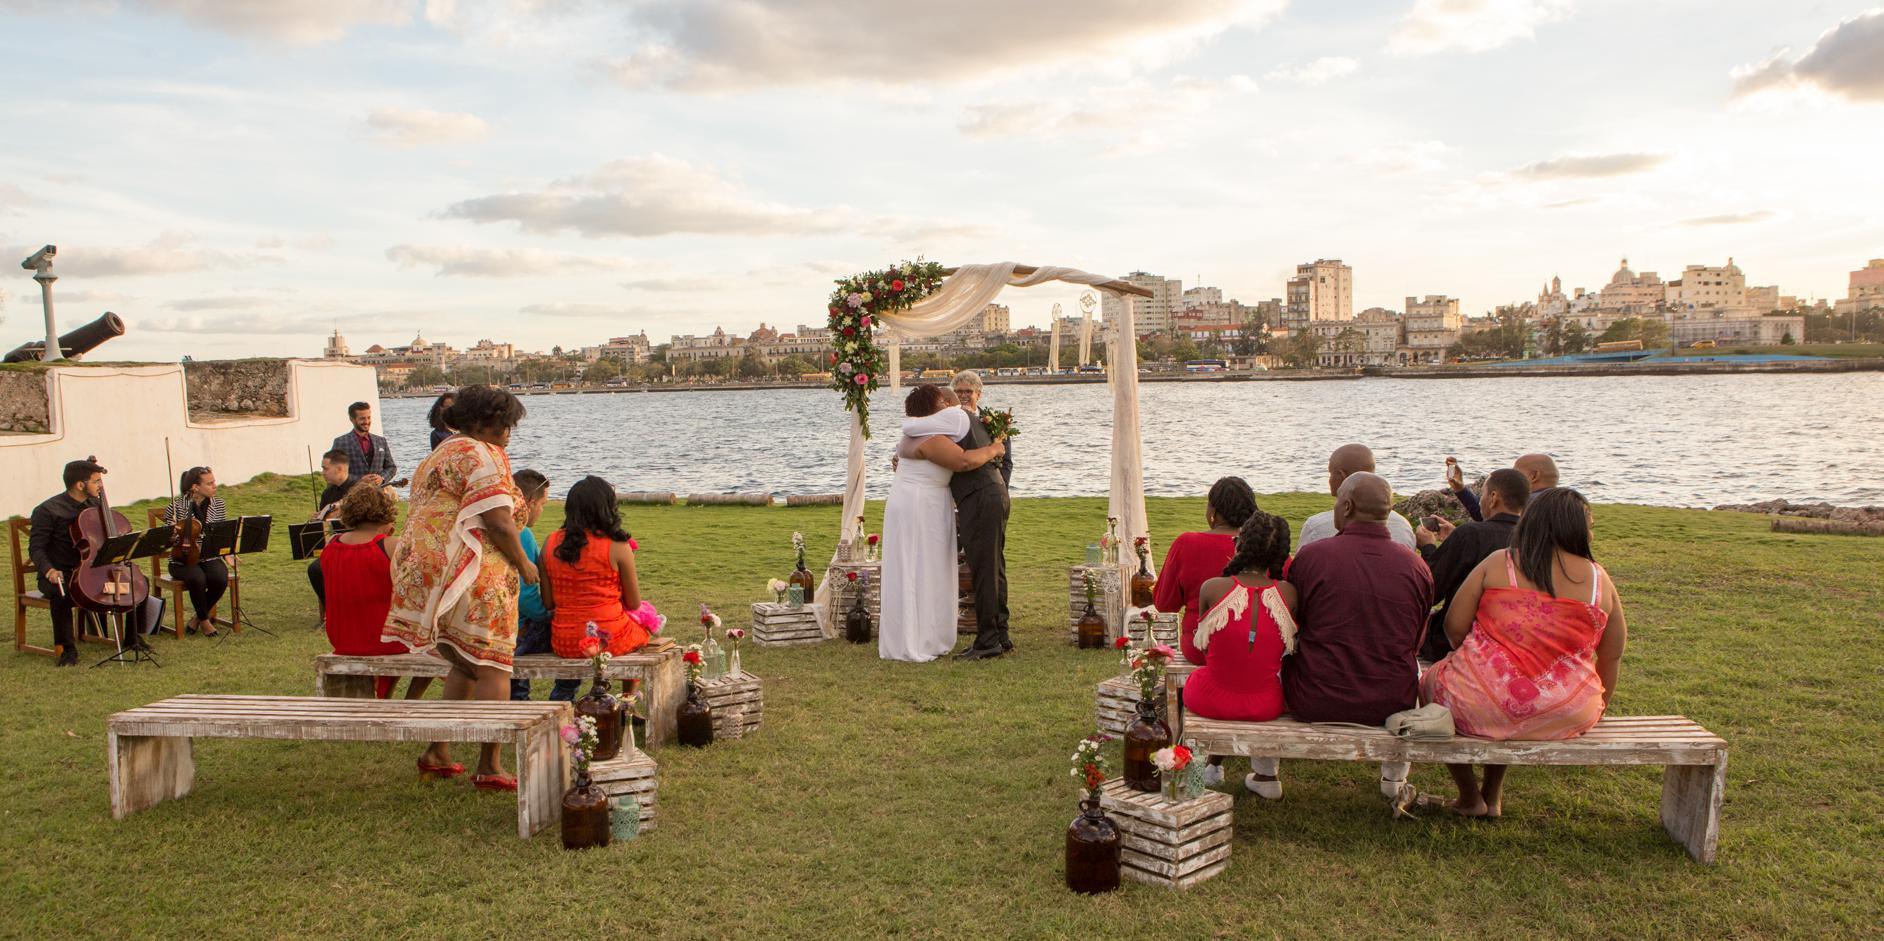 bodas-sin-clasificar-sin-tema-cuba-42191.jpg